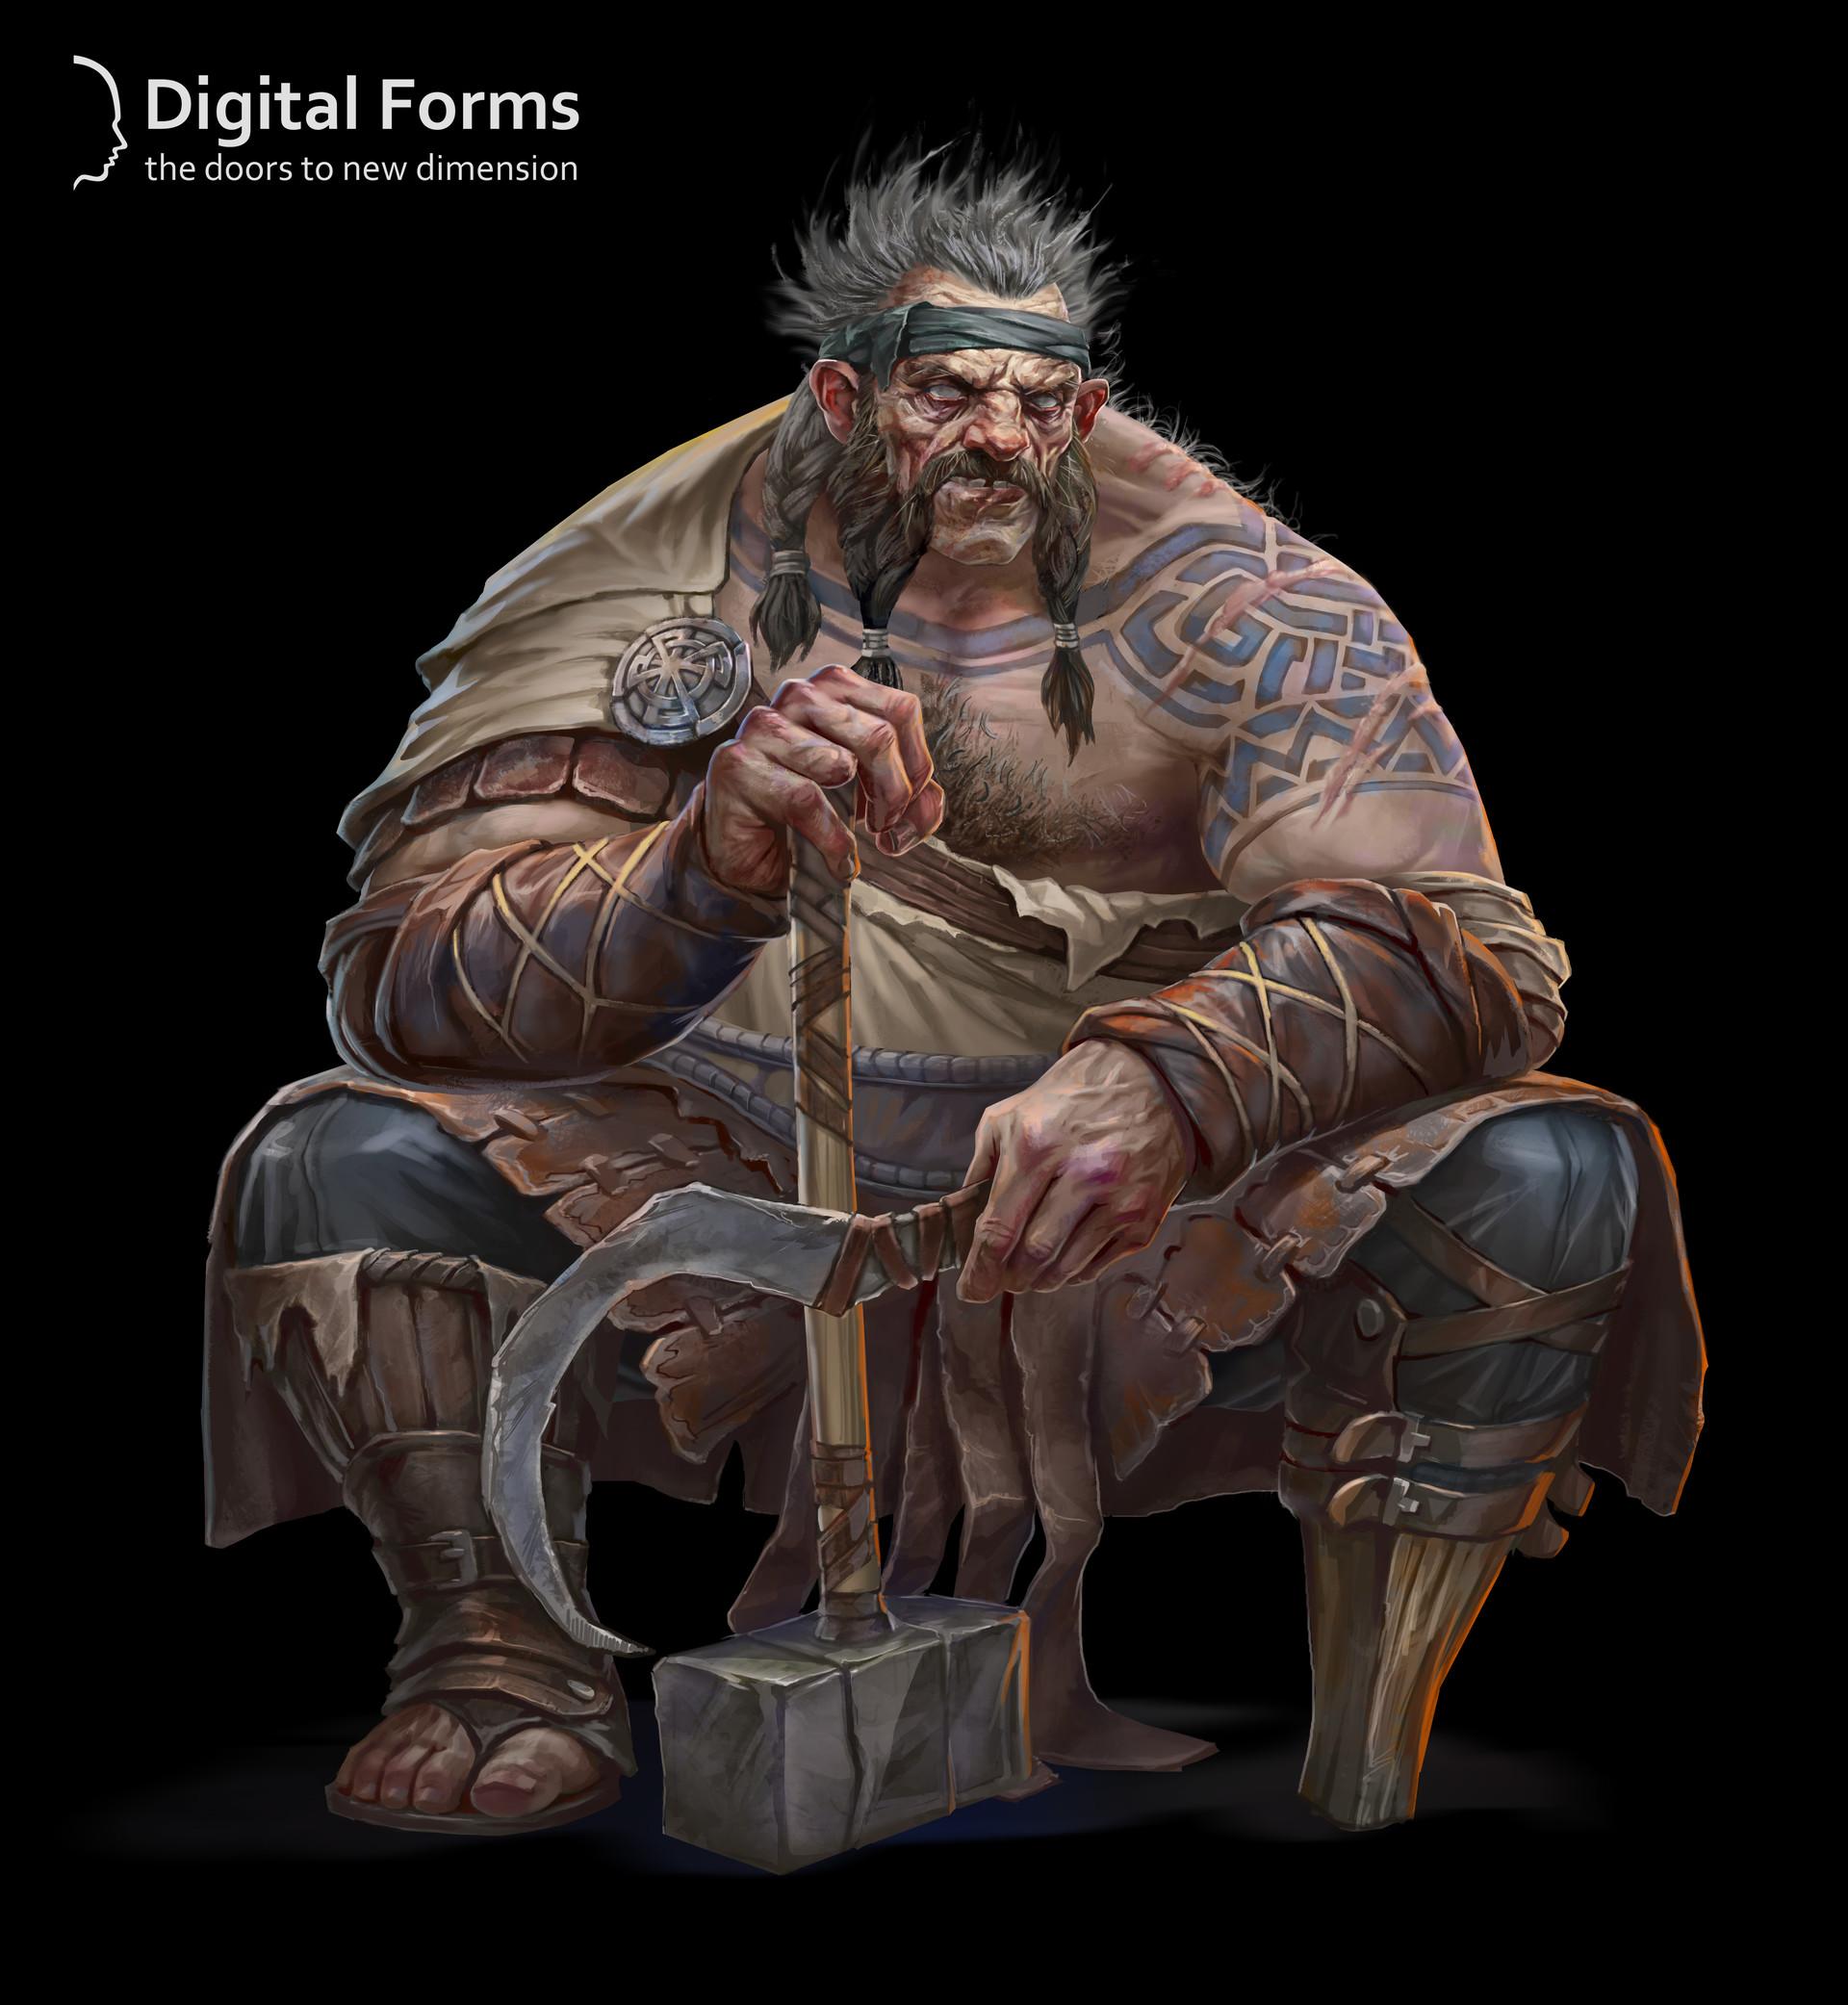 Digital forms blacksmith